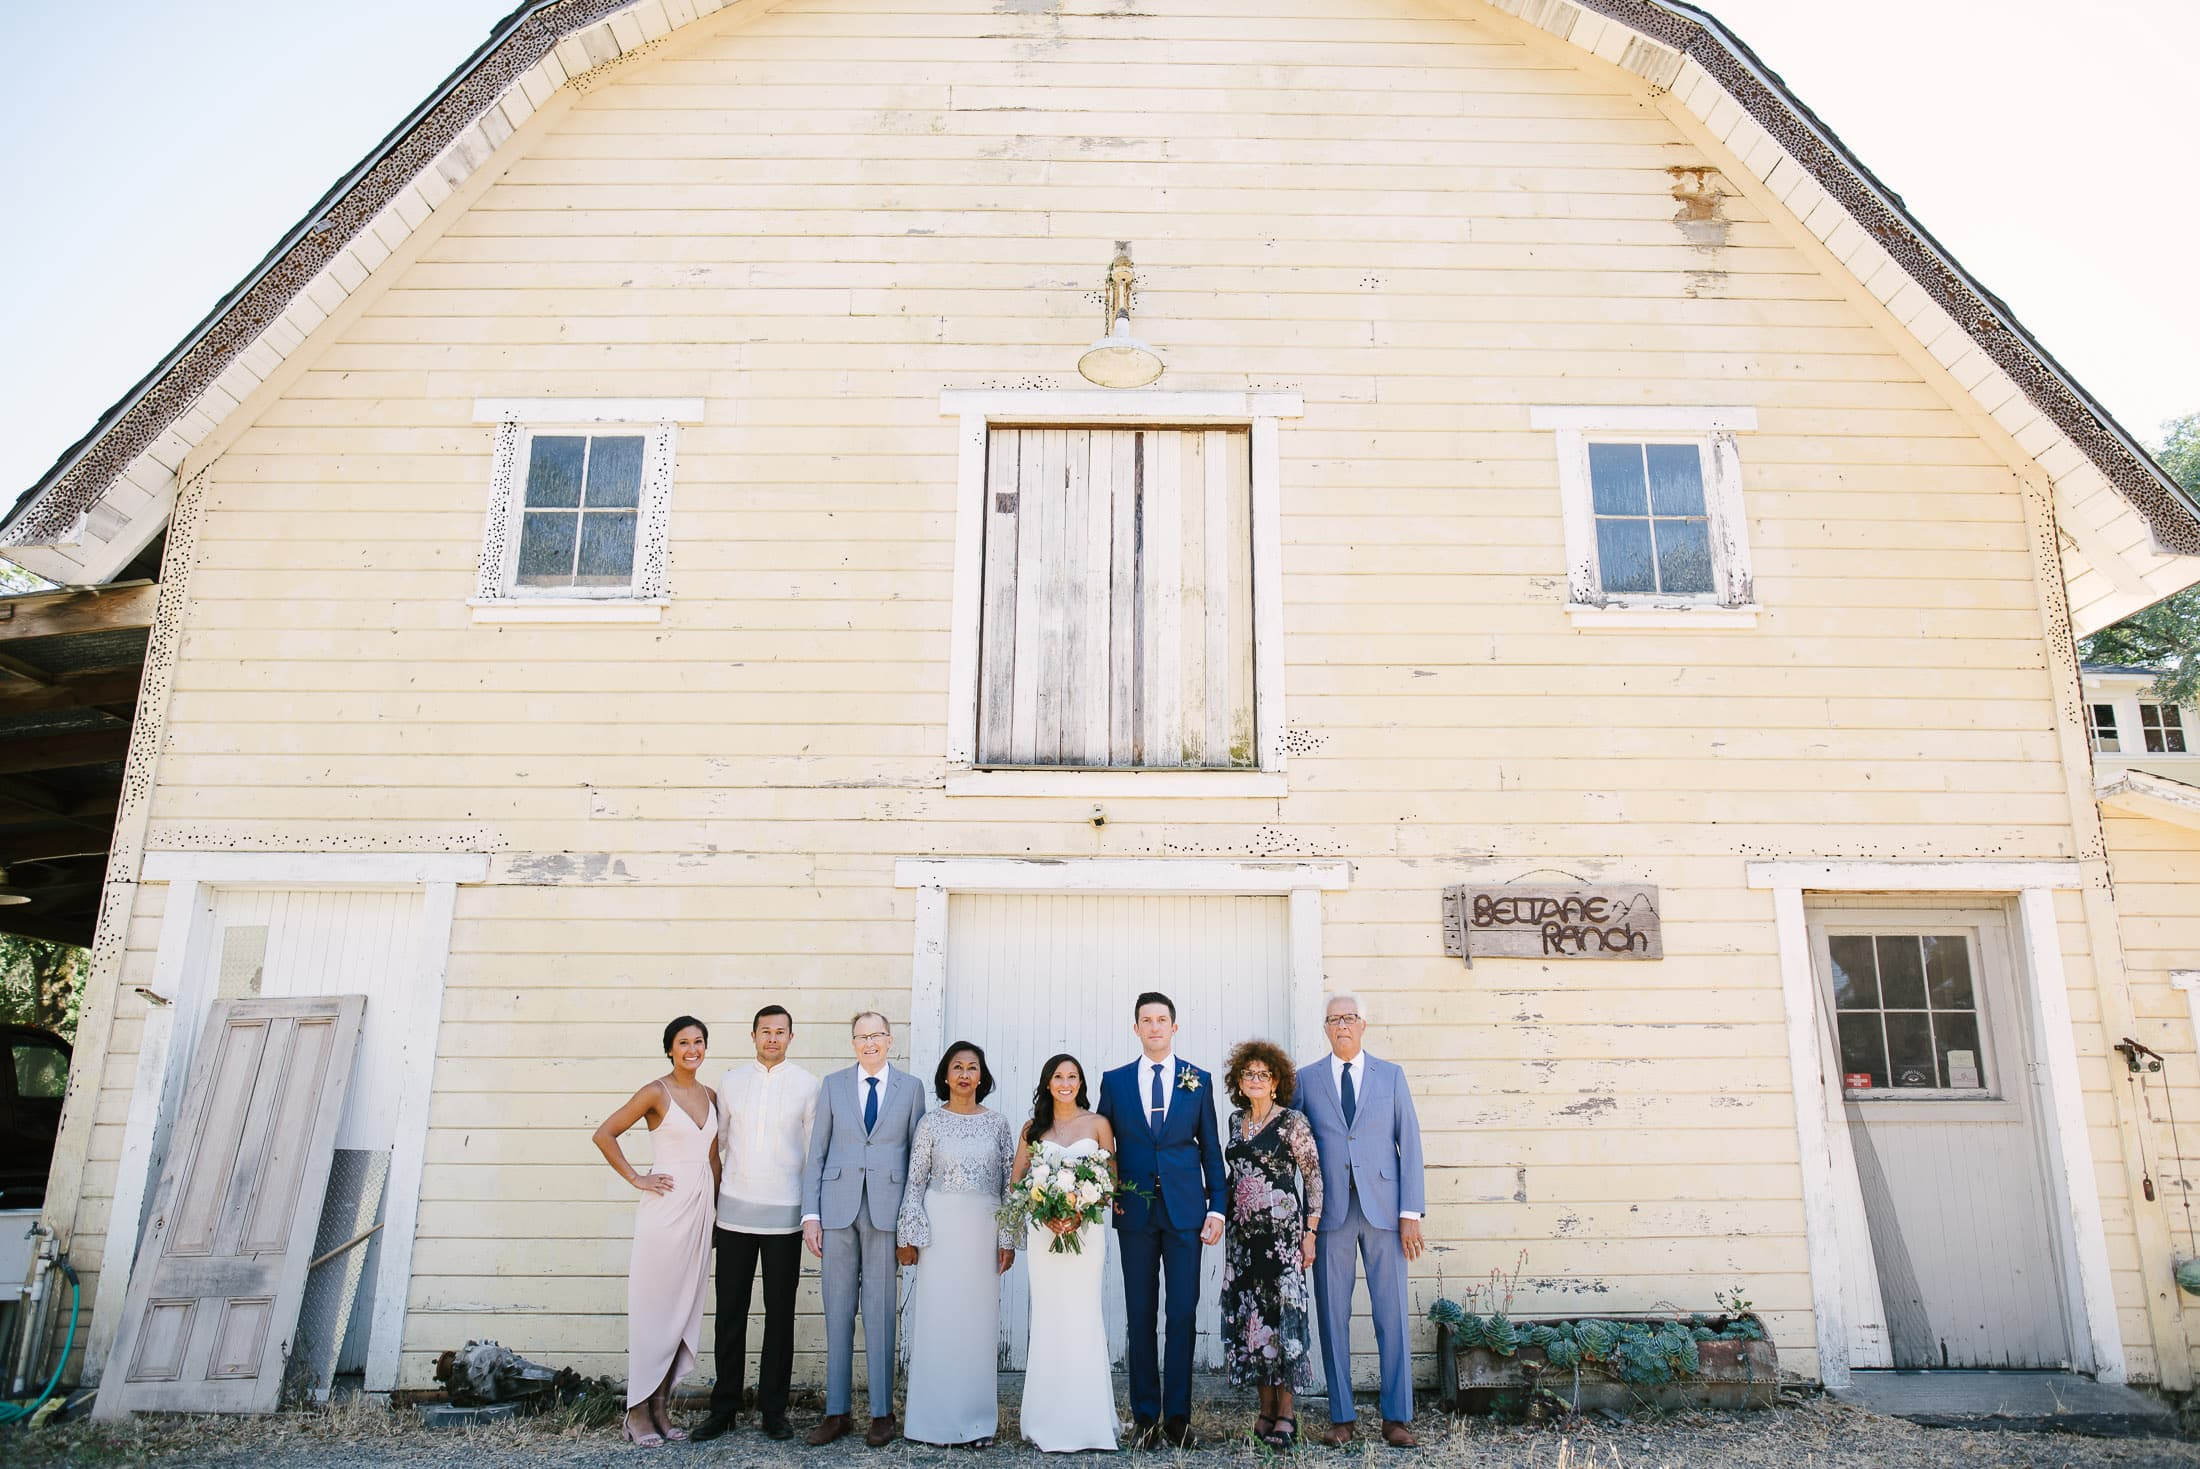 Beltane Ranch Wedding Family Portrait